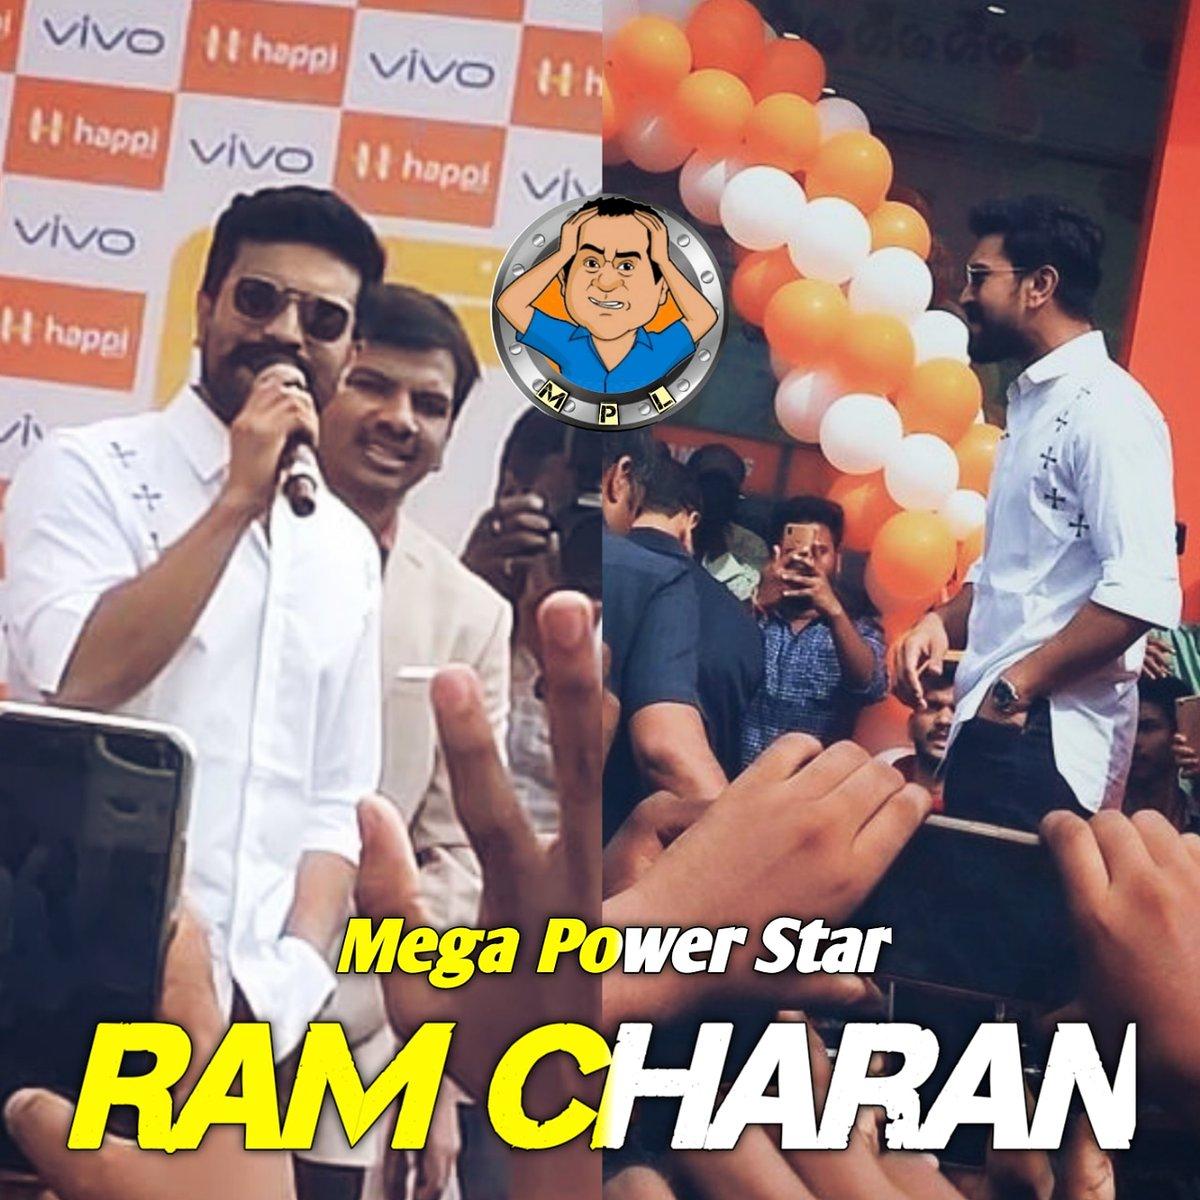 #RamCharanAtVijayawada To Launch @happimobiles New Store  . . #mindpotundhilopala  #mindpothundilopala1 . Do follow @Mindpotundhilo1 . #ramcharan #ramcharanteja #rangasthalam #rangasthalam #rangastalam1985 #ramcharan_cherry #ramcharanfans #ramcharanforeverpic.twitter.com/TIynYU6drz